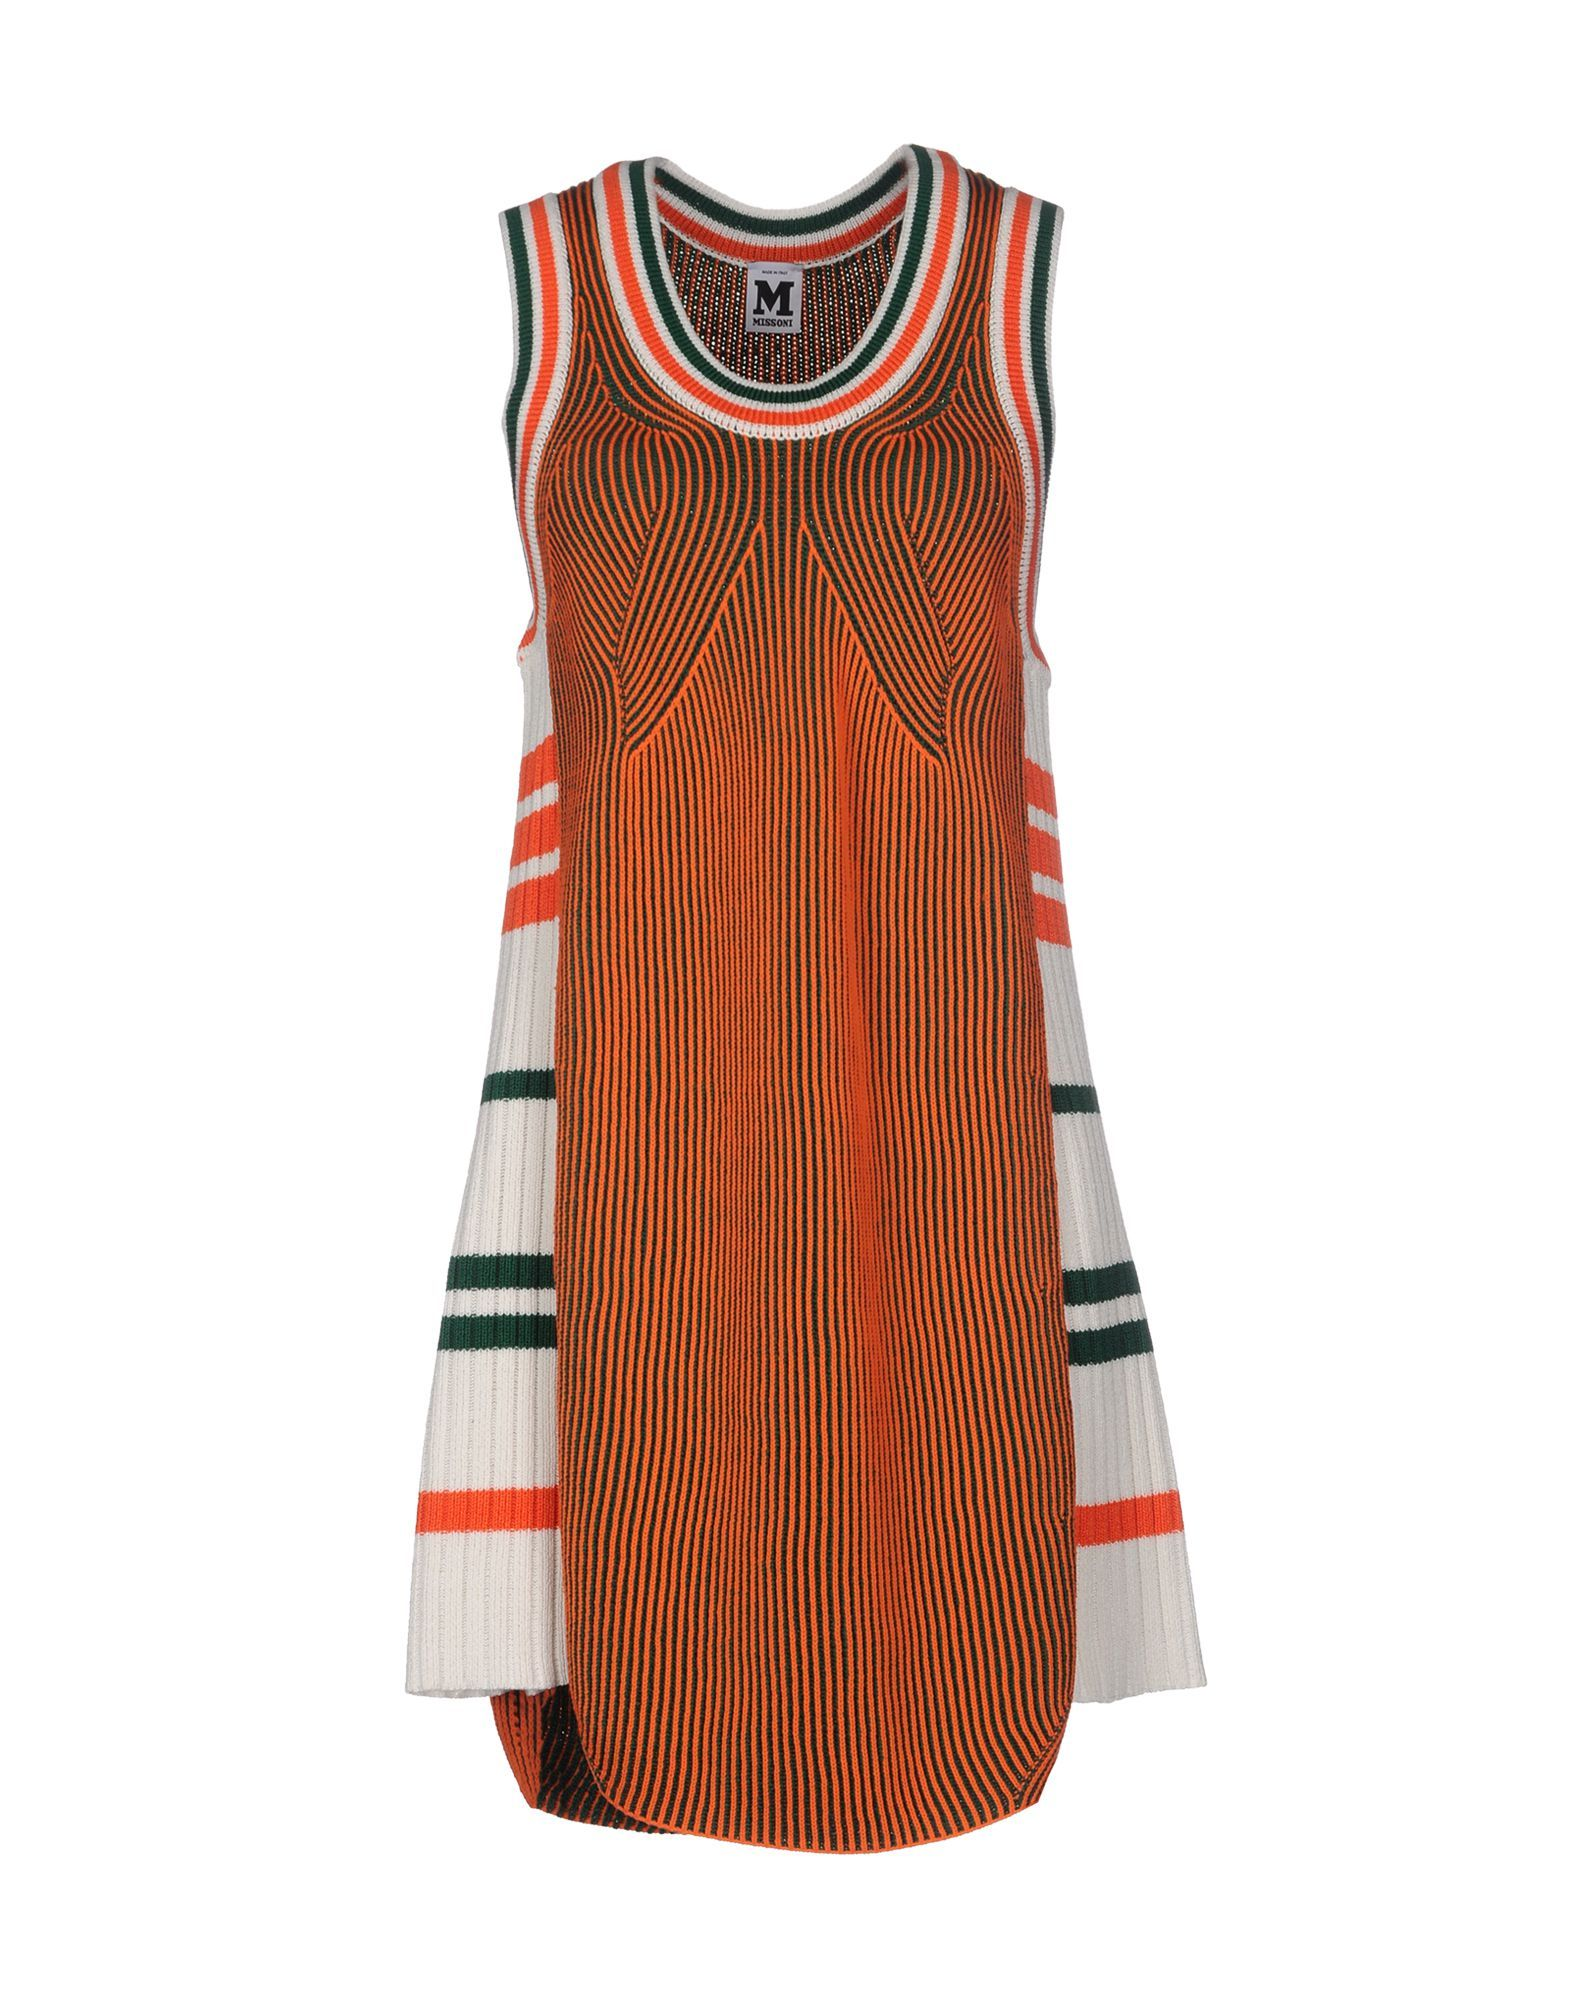 958d4aa8bbe M Missoni Short Dress - Women M Missoni Short Dresses online on YOOX Kuwait  - 34594507CM